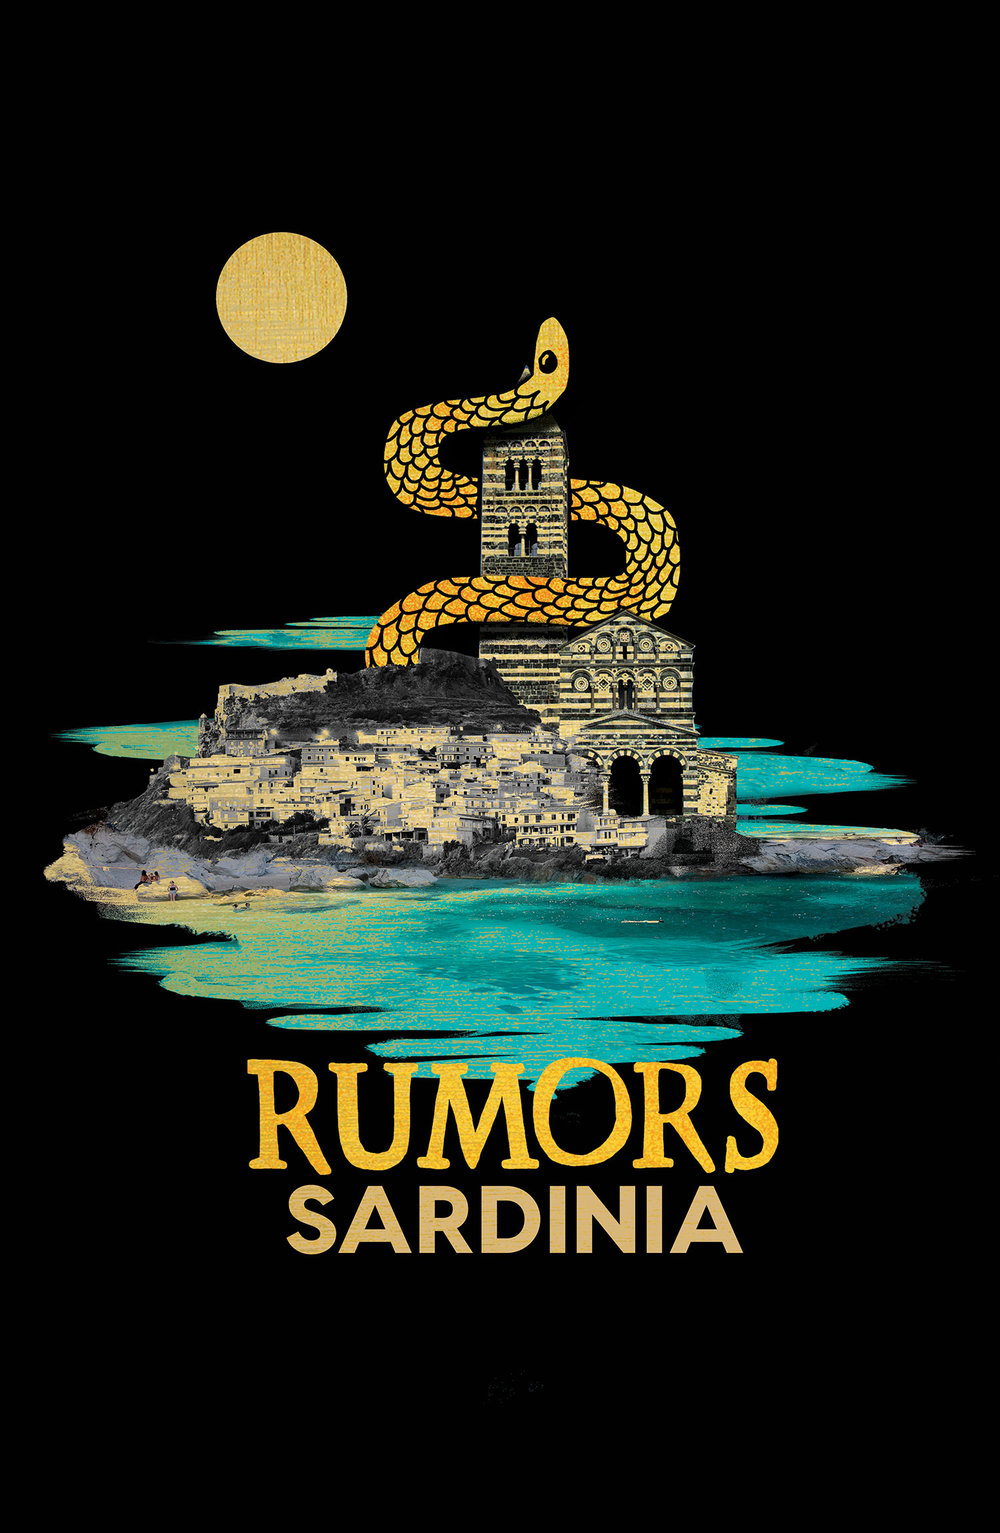 05-Rumors-Sardinia.jpg